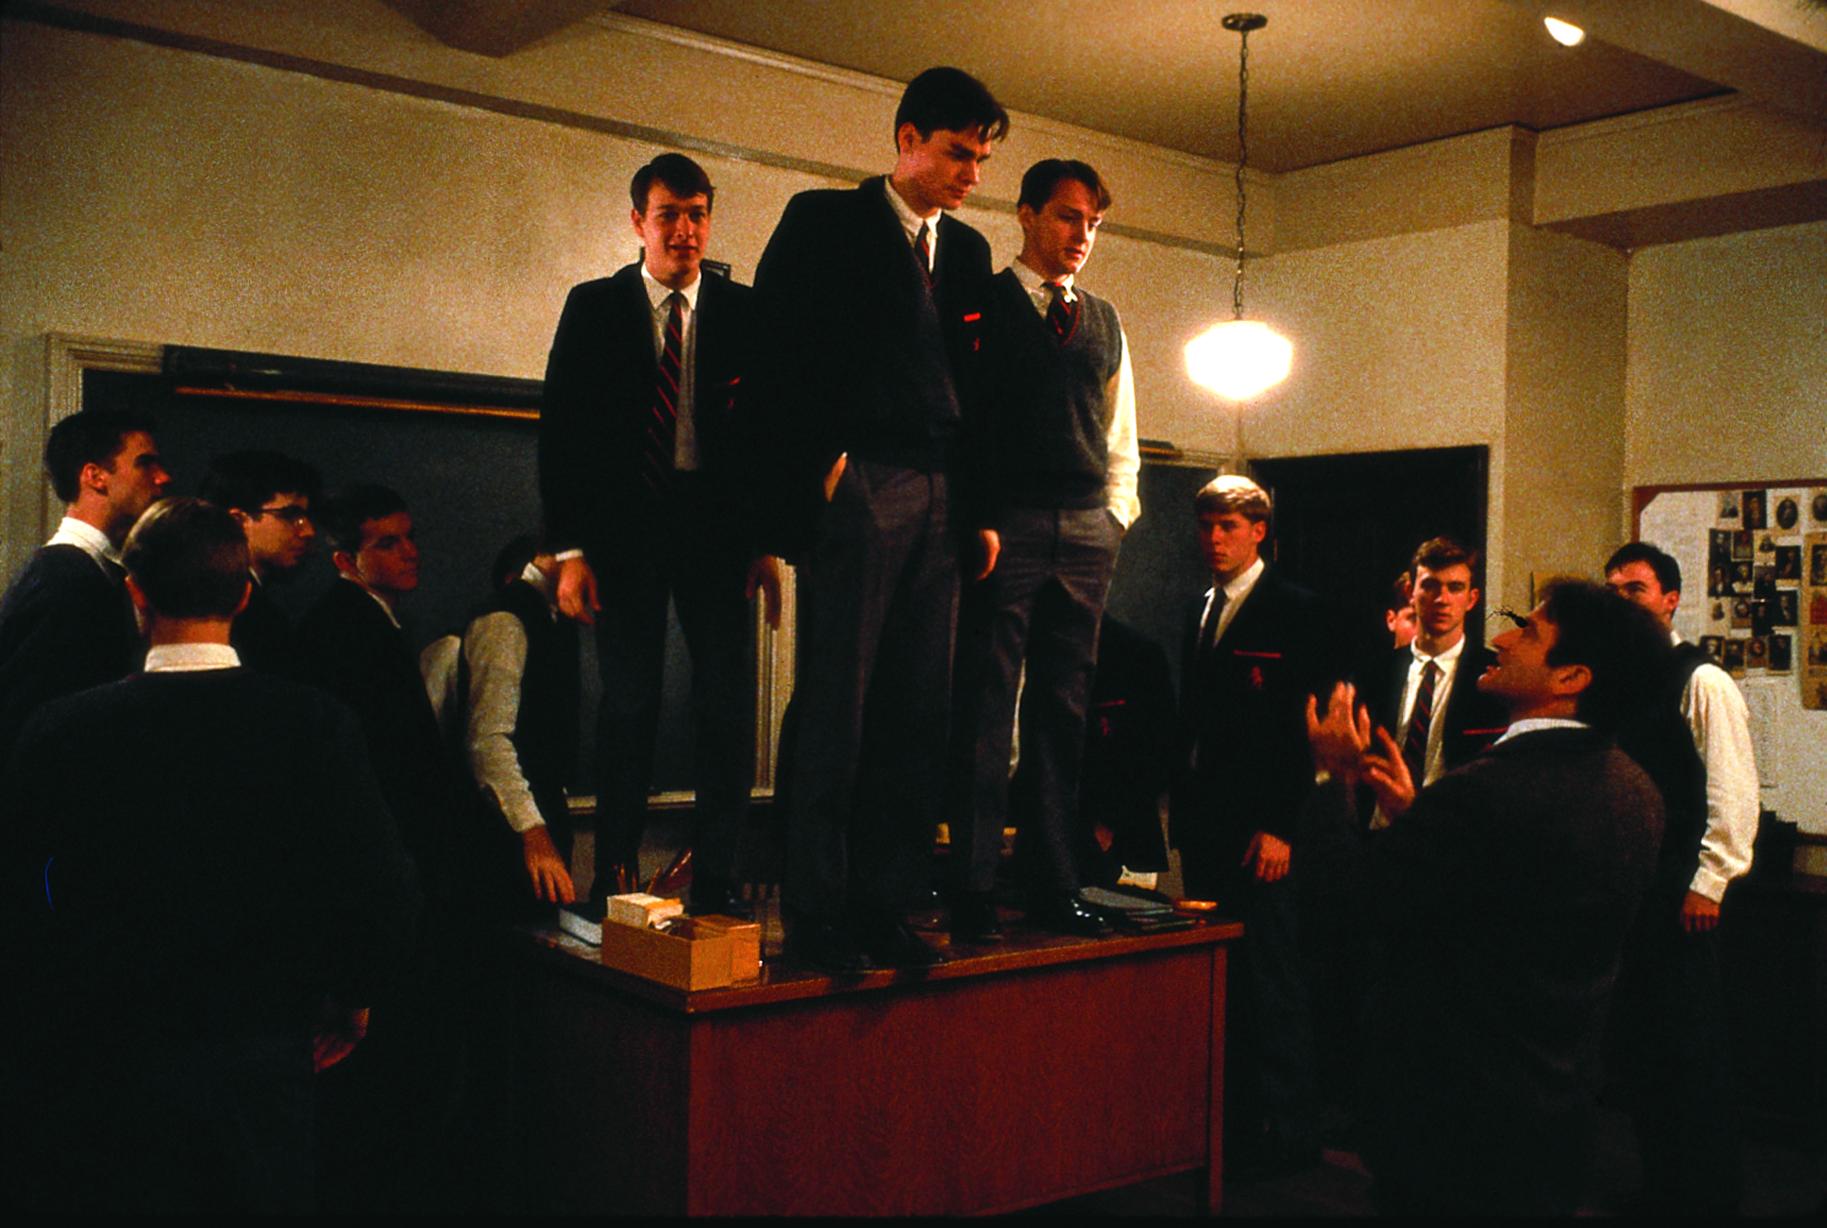 Robin Williams, Robert Sean Leonard, Josh Charles, and Gale Hansen in Dead Poets Society (1989)